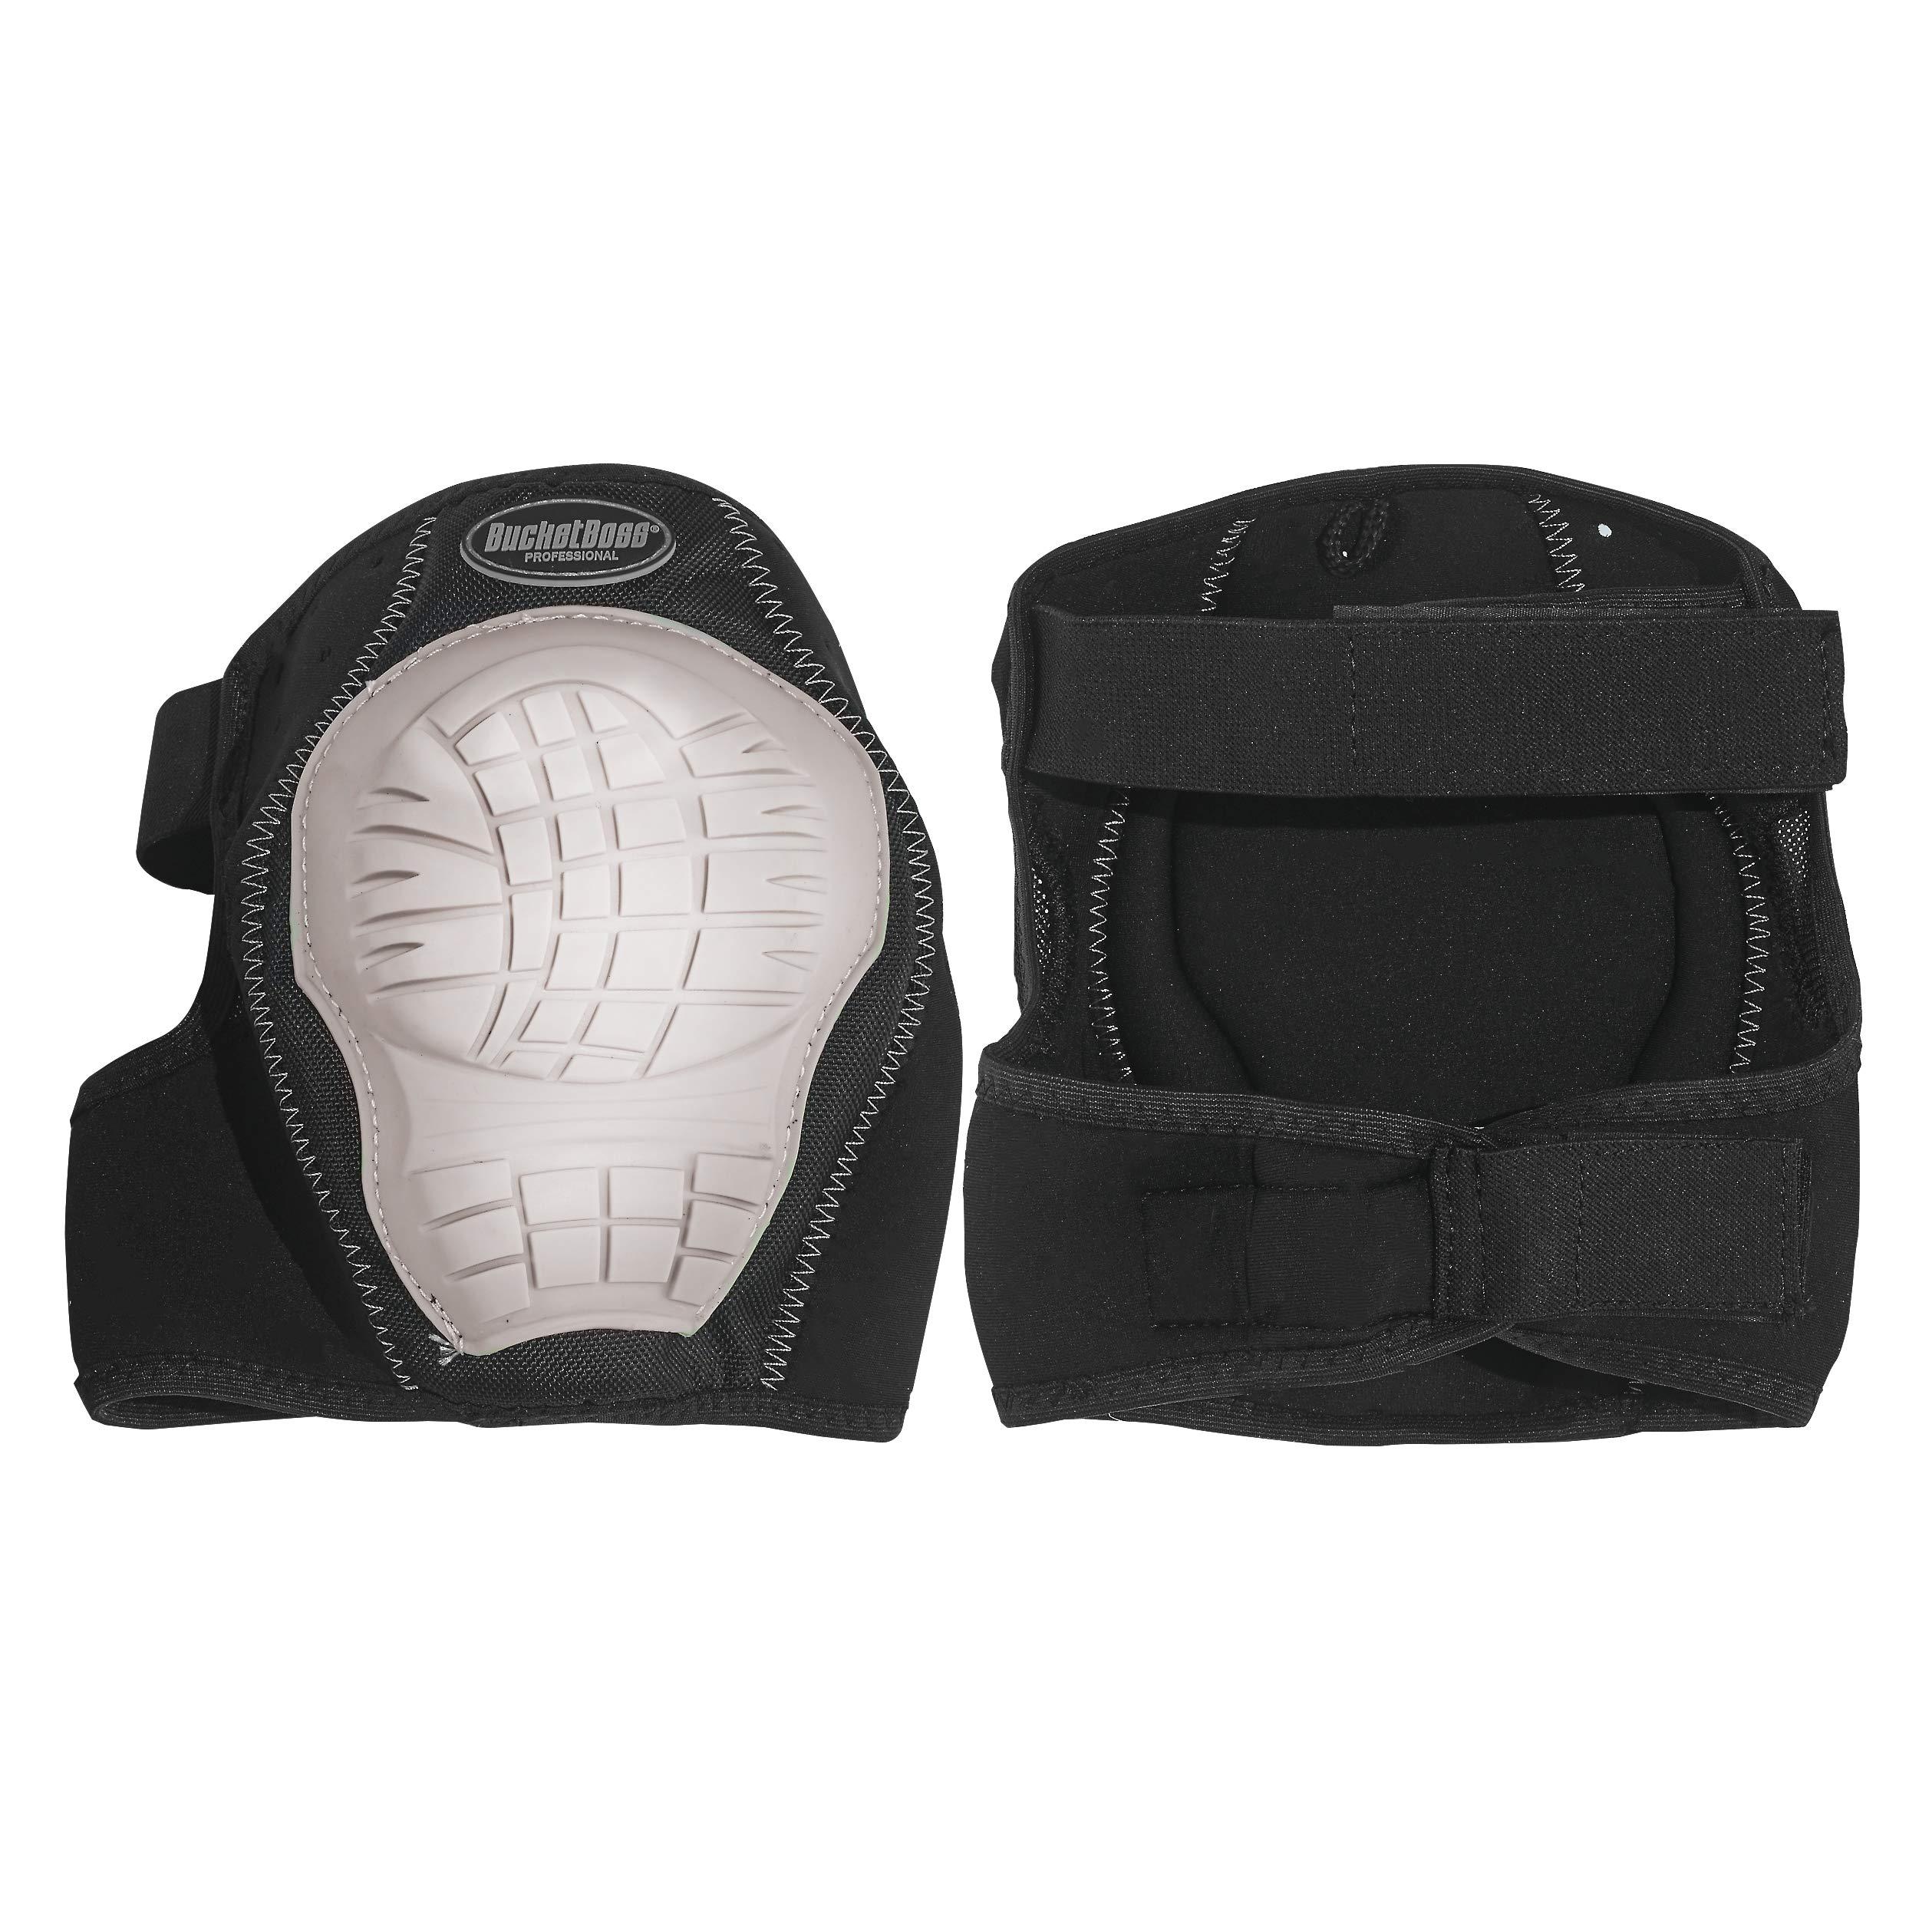 Bucket Boss NeoFlex Soft Shell Knee Pads in White, 92200 by Bucket Boss